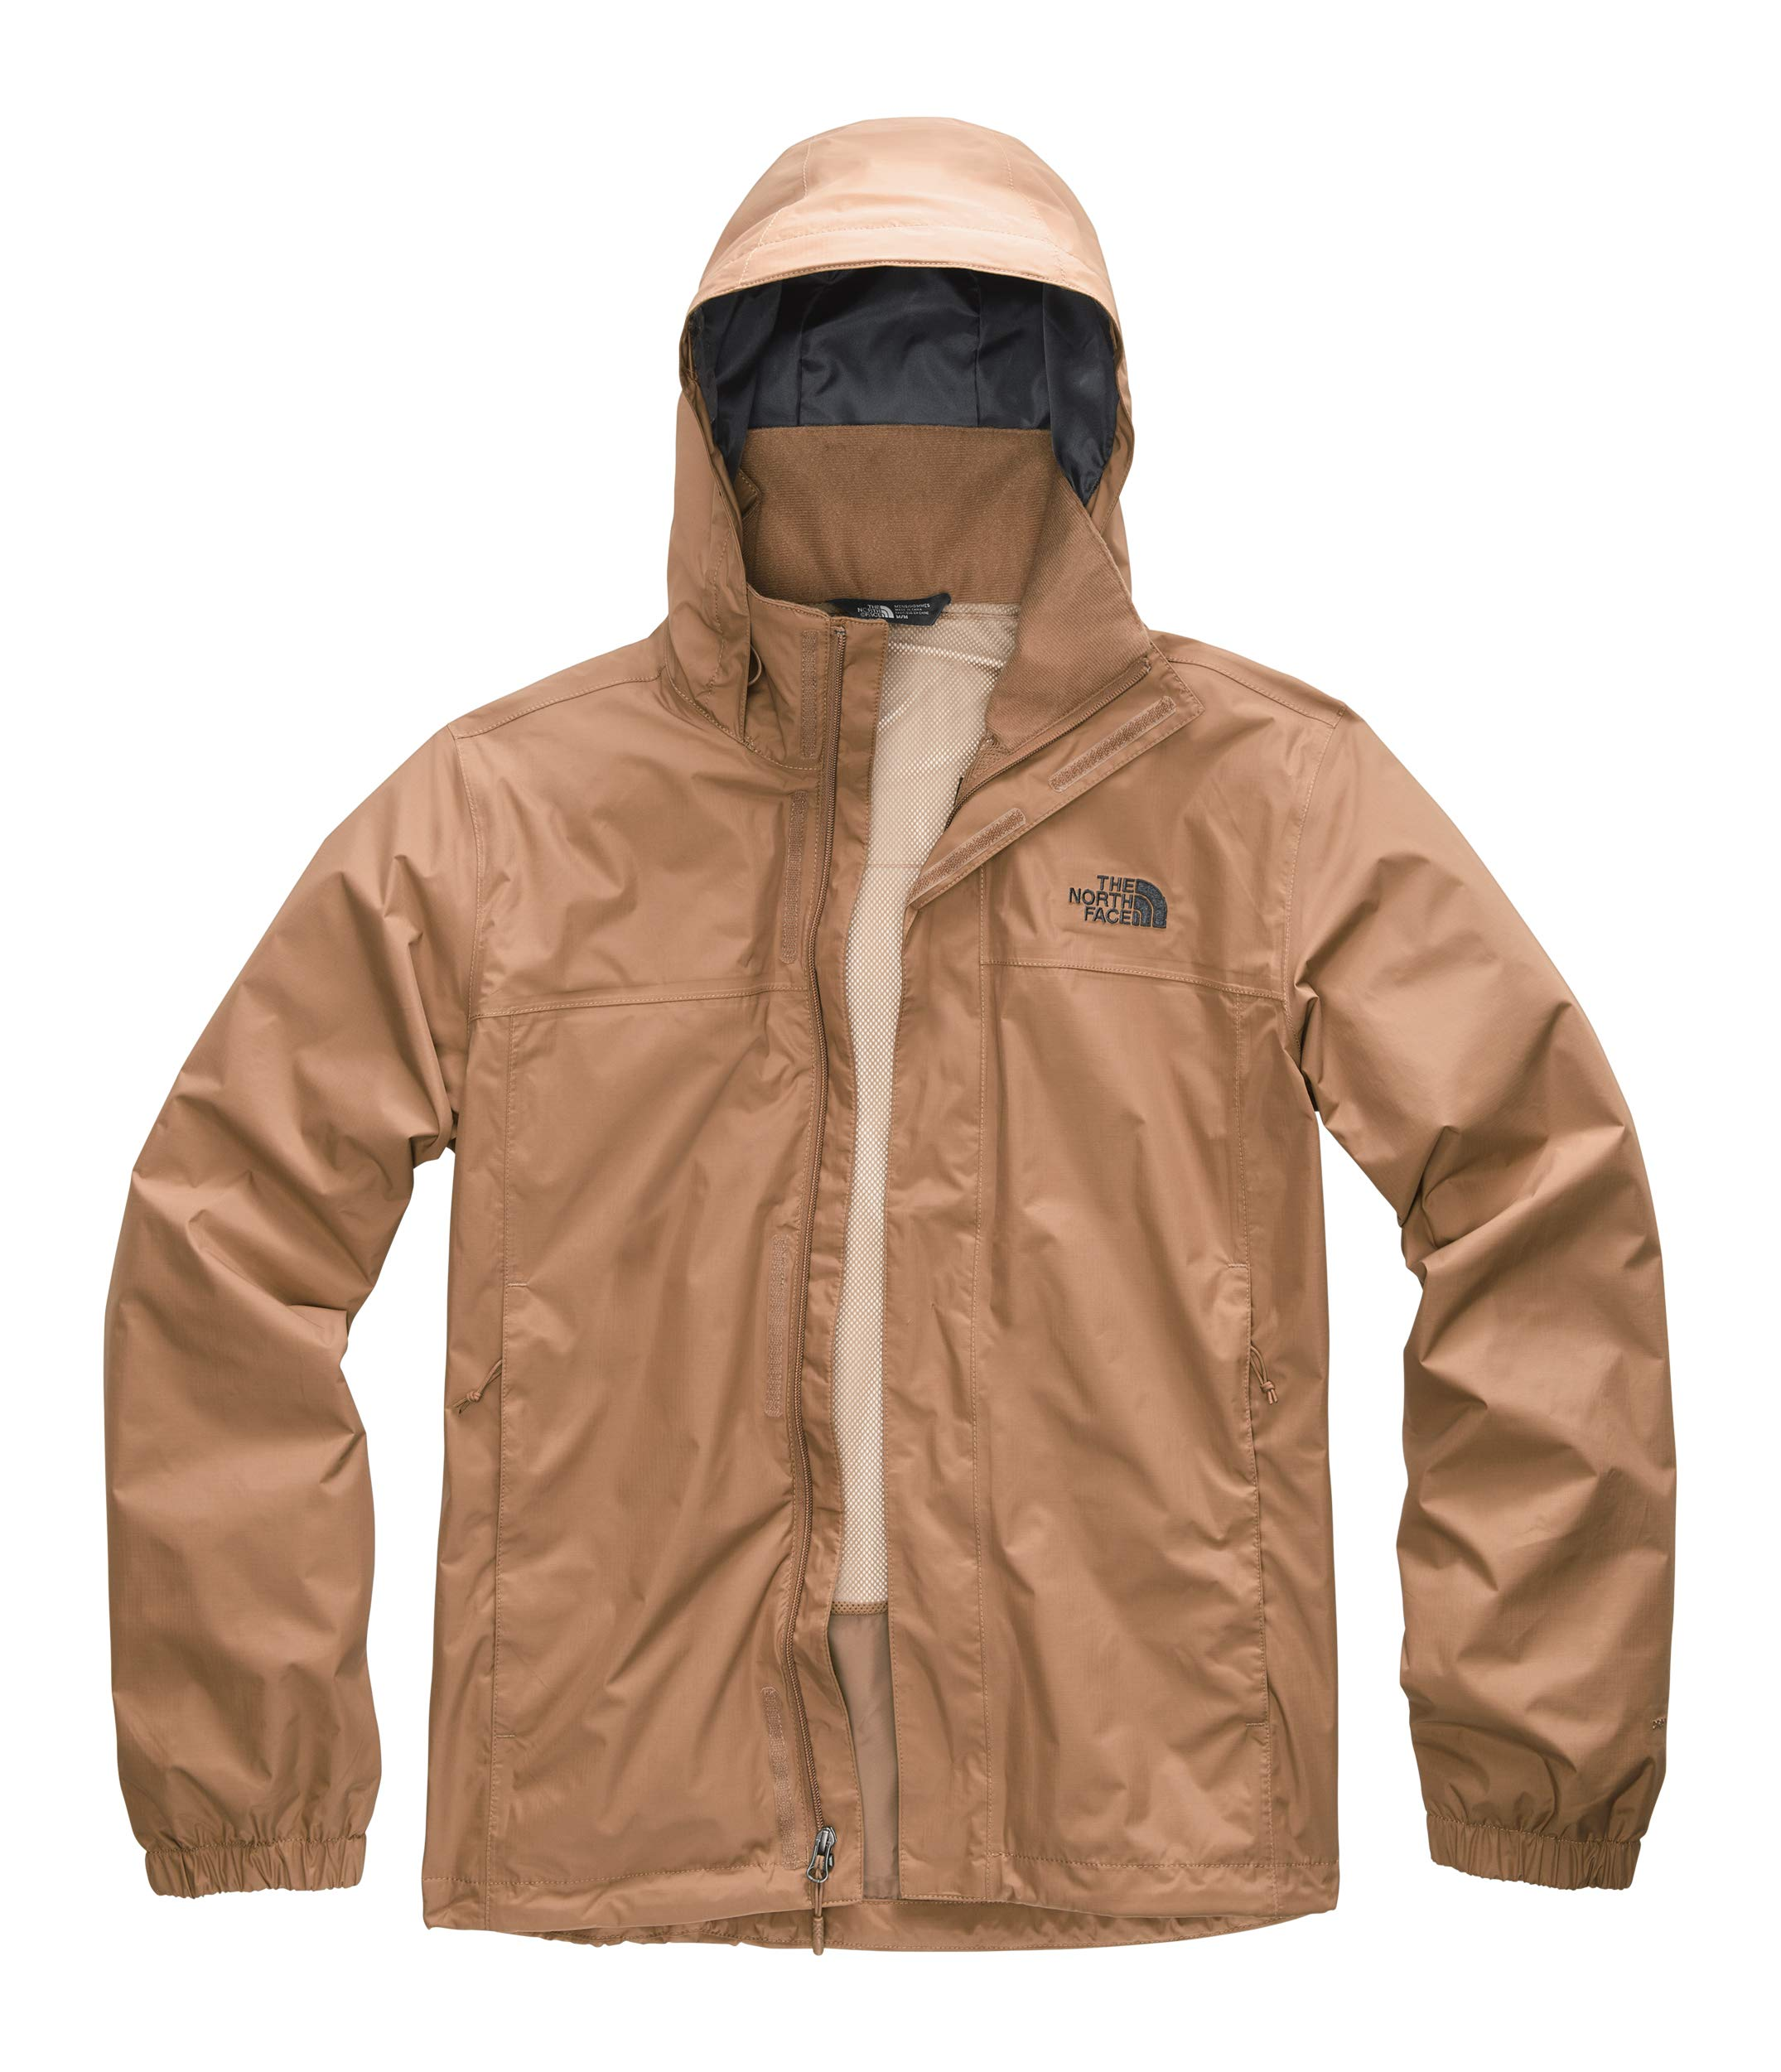 The North Face Men's Resolve 2 Jacket Cargo Khaki Small